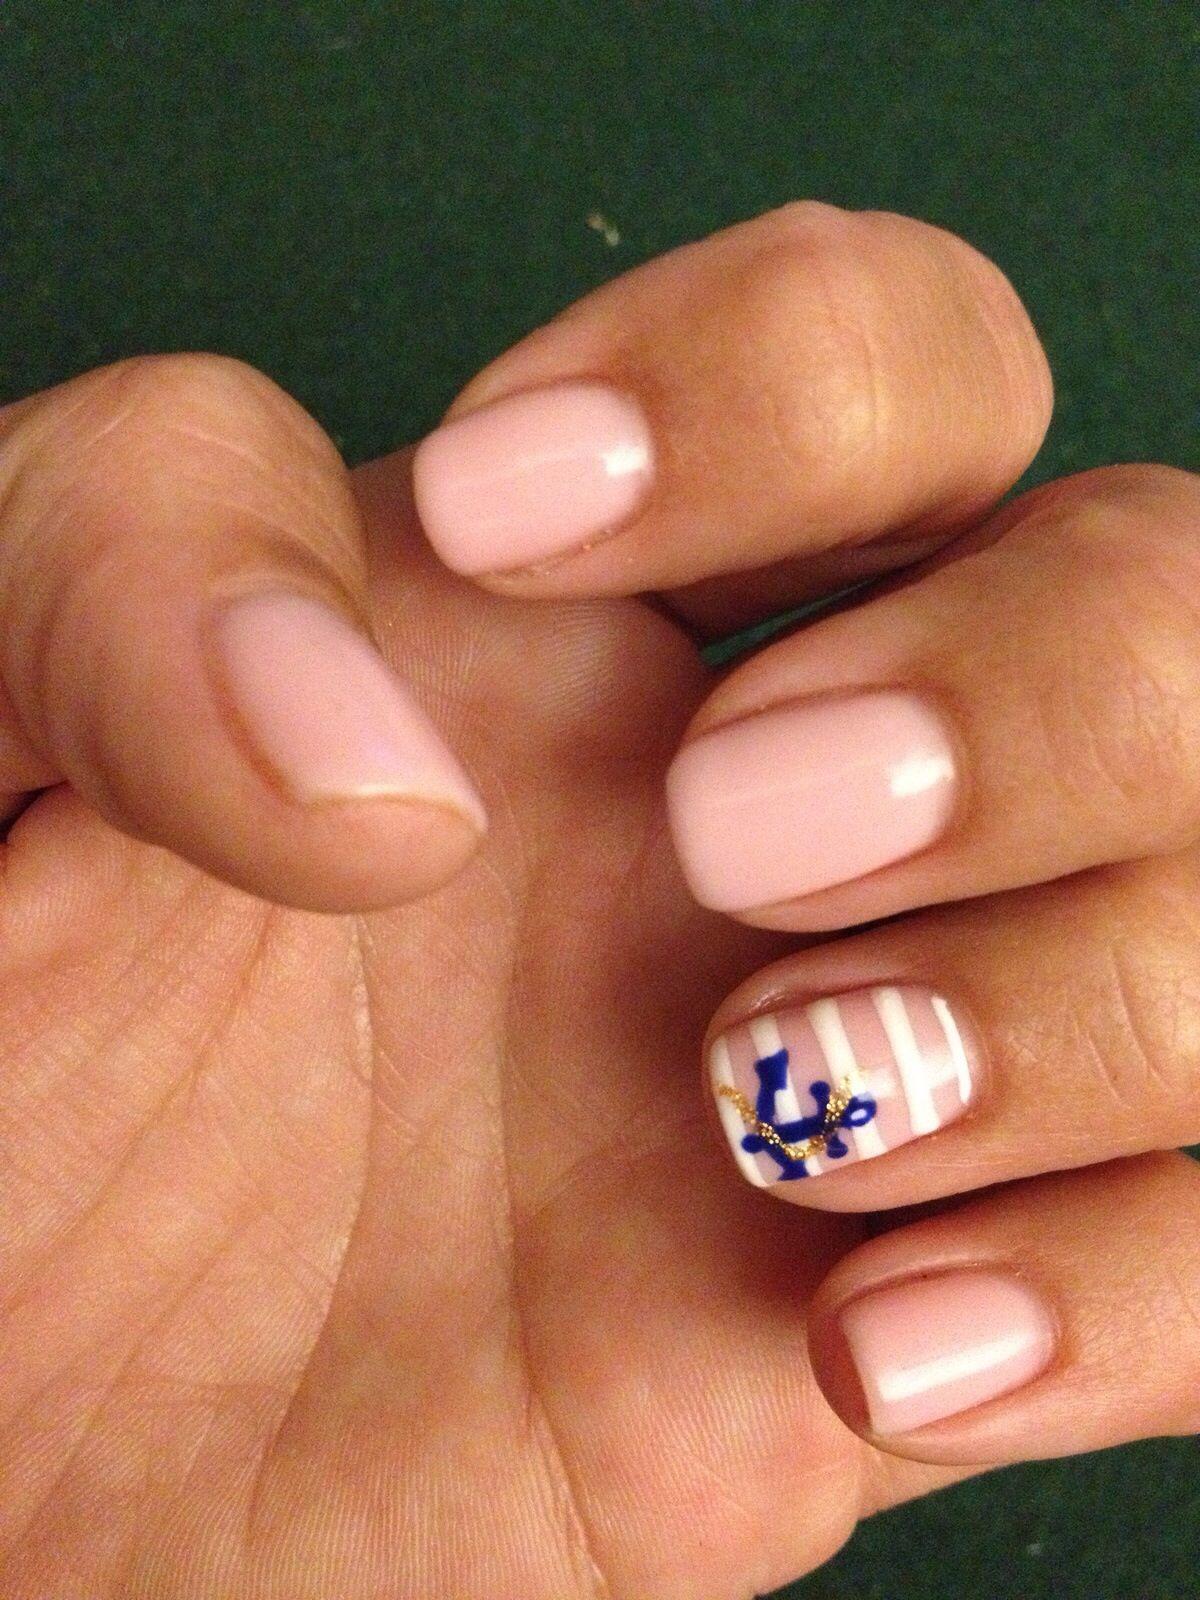 Really Cute Nail Idea To Do For The Beach Summer Vacation Nails